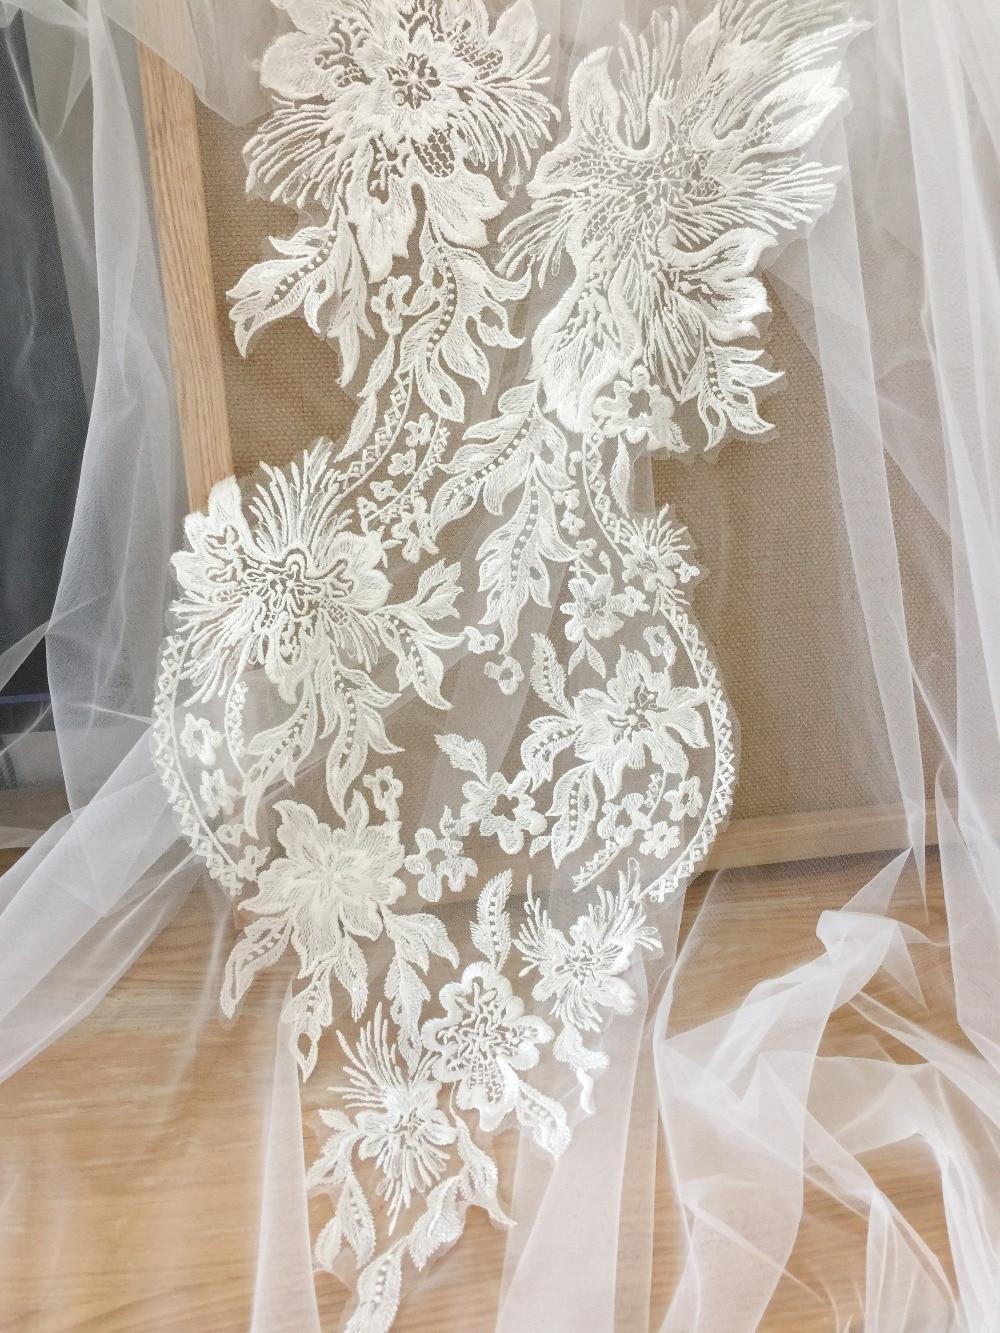 Ivory Cording Embroidery Applique New Wedding Dress Veil Lace Applique